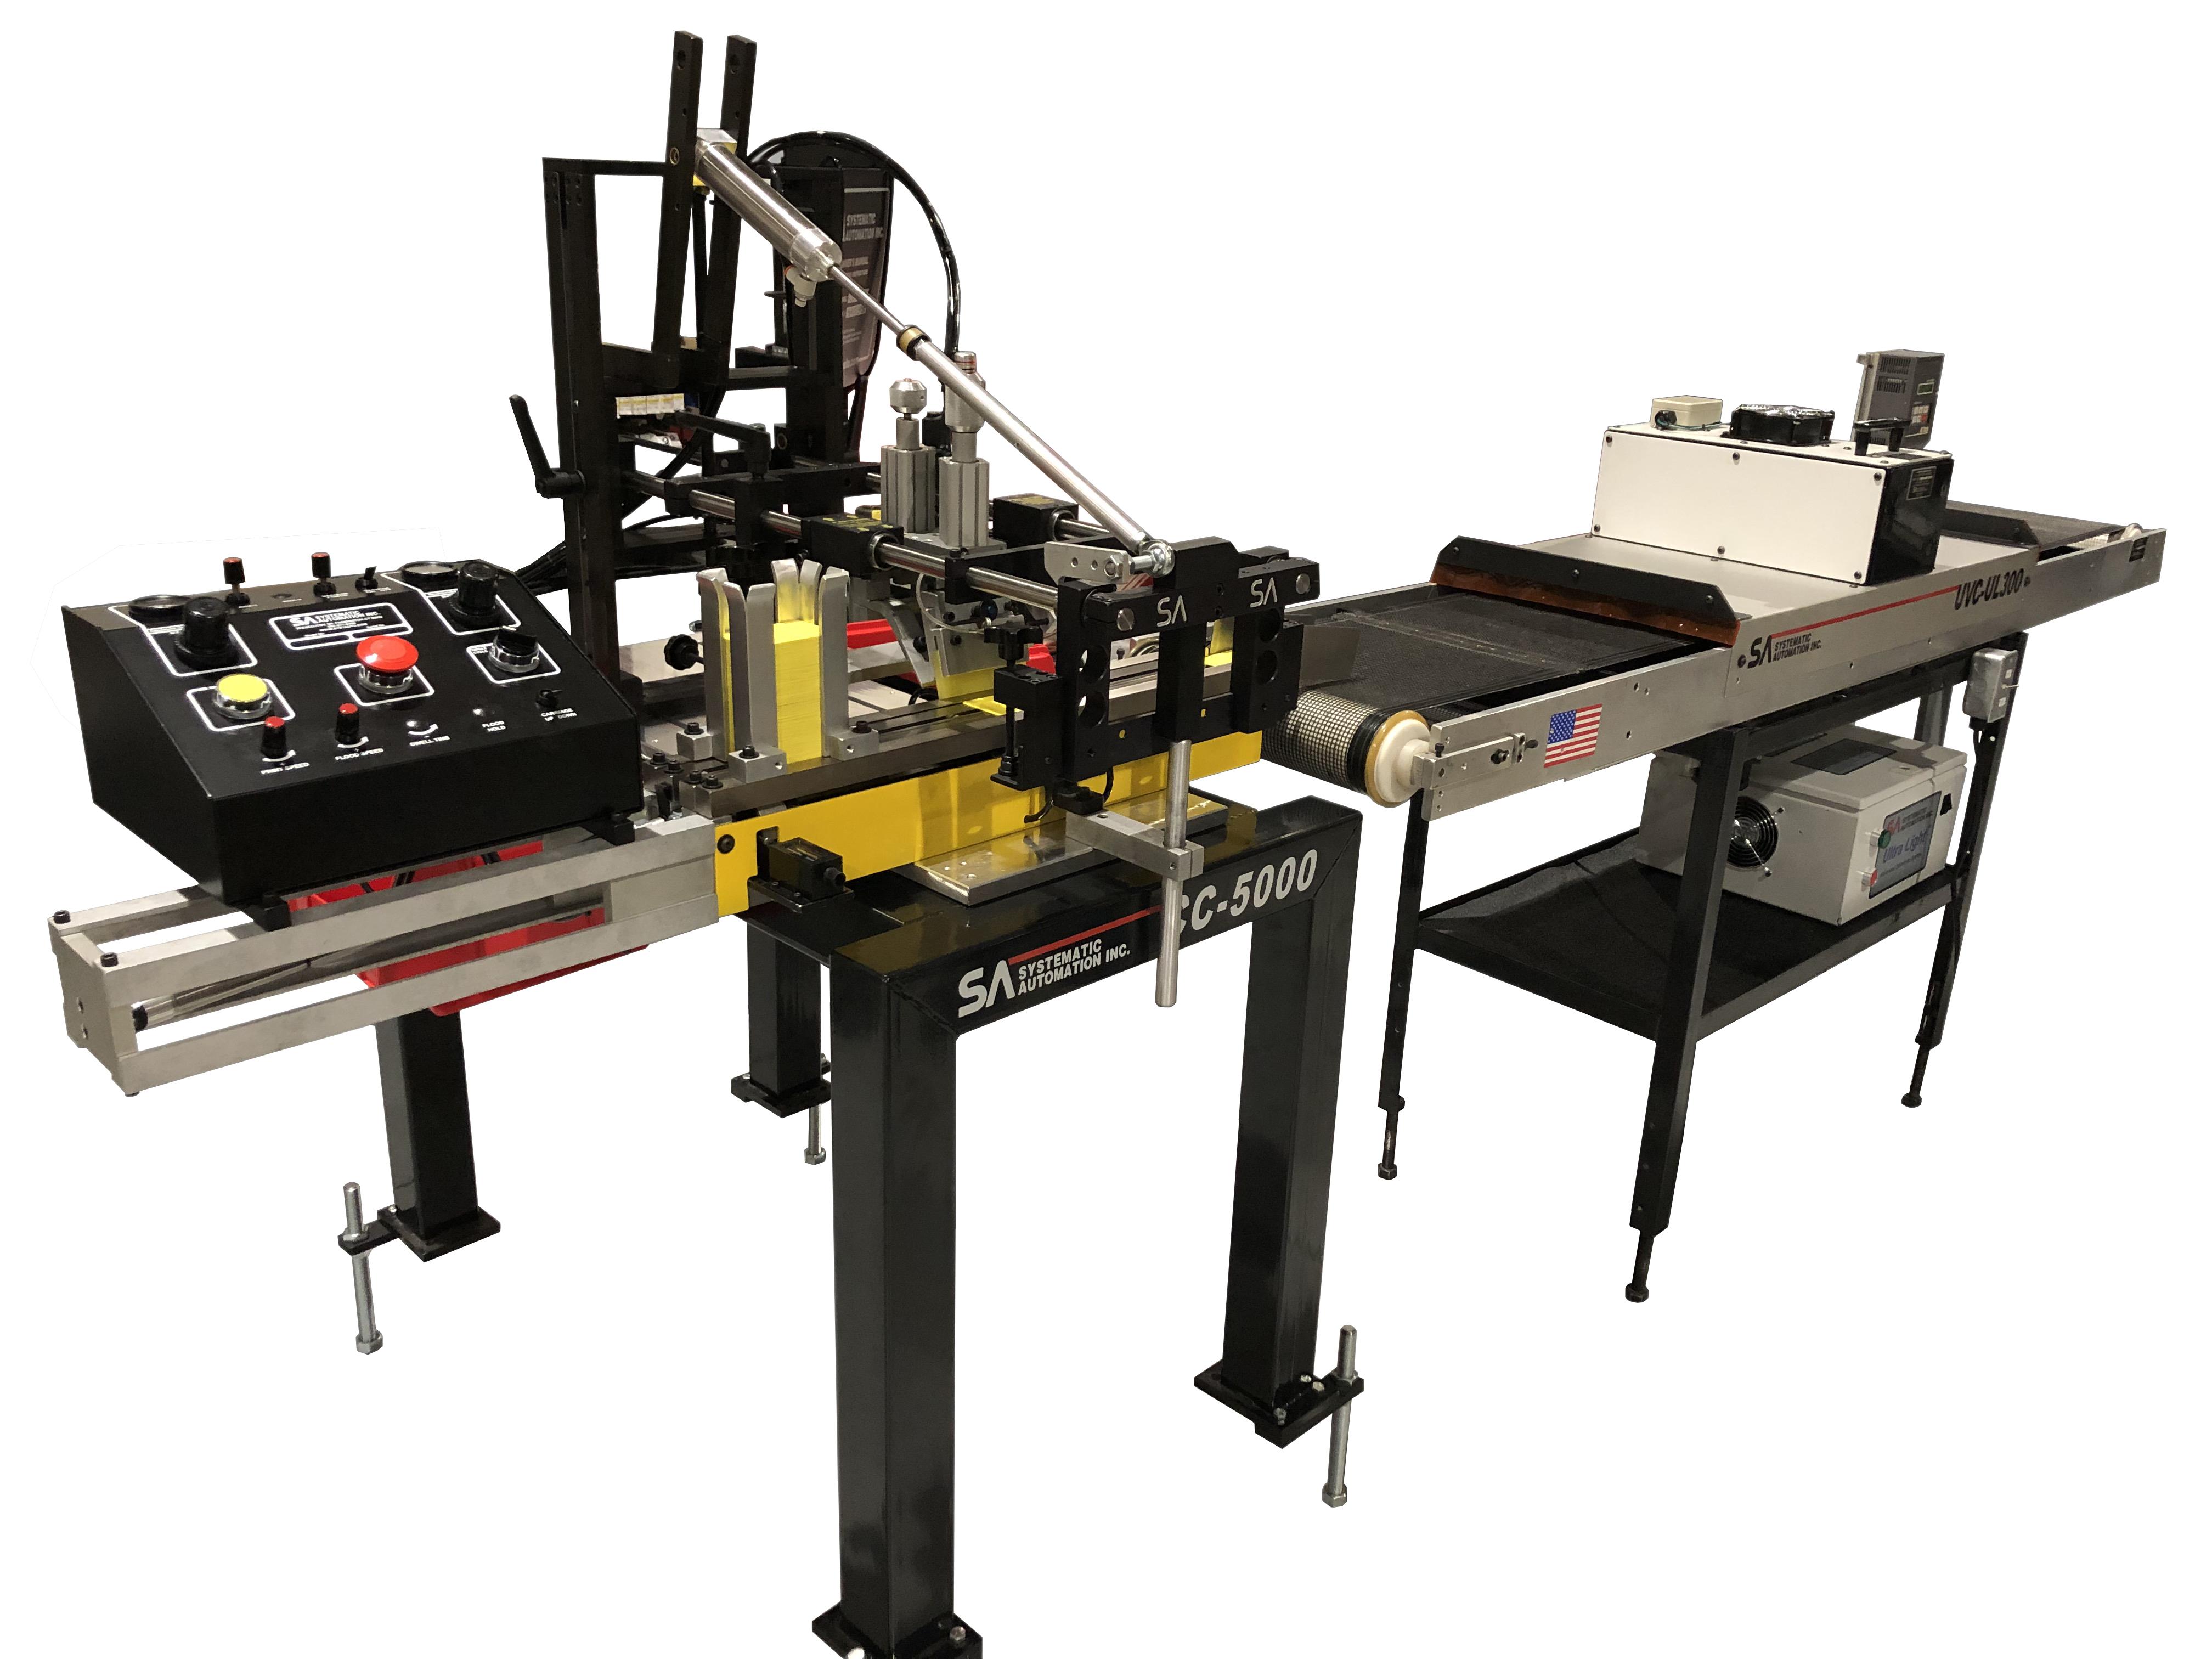 Model CC-5000 Automatic Screen Printer